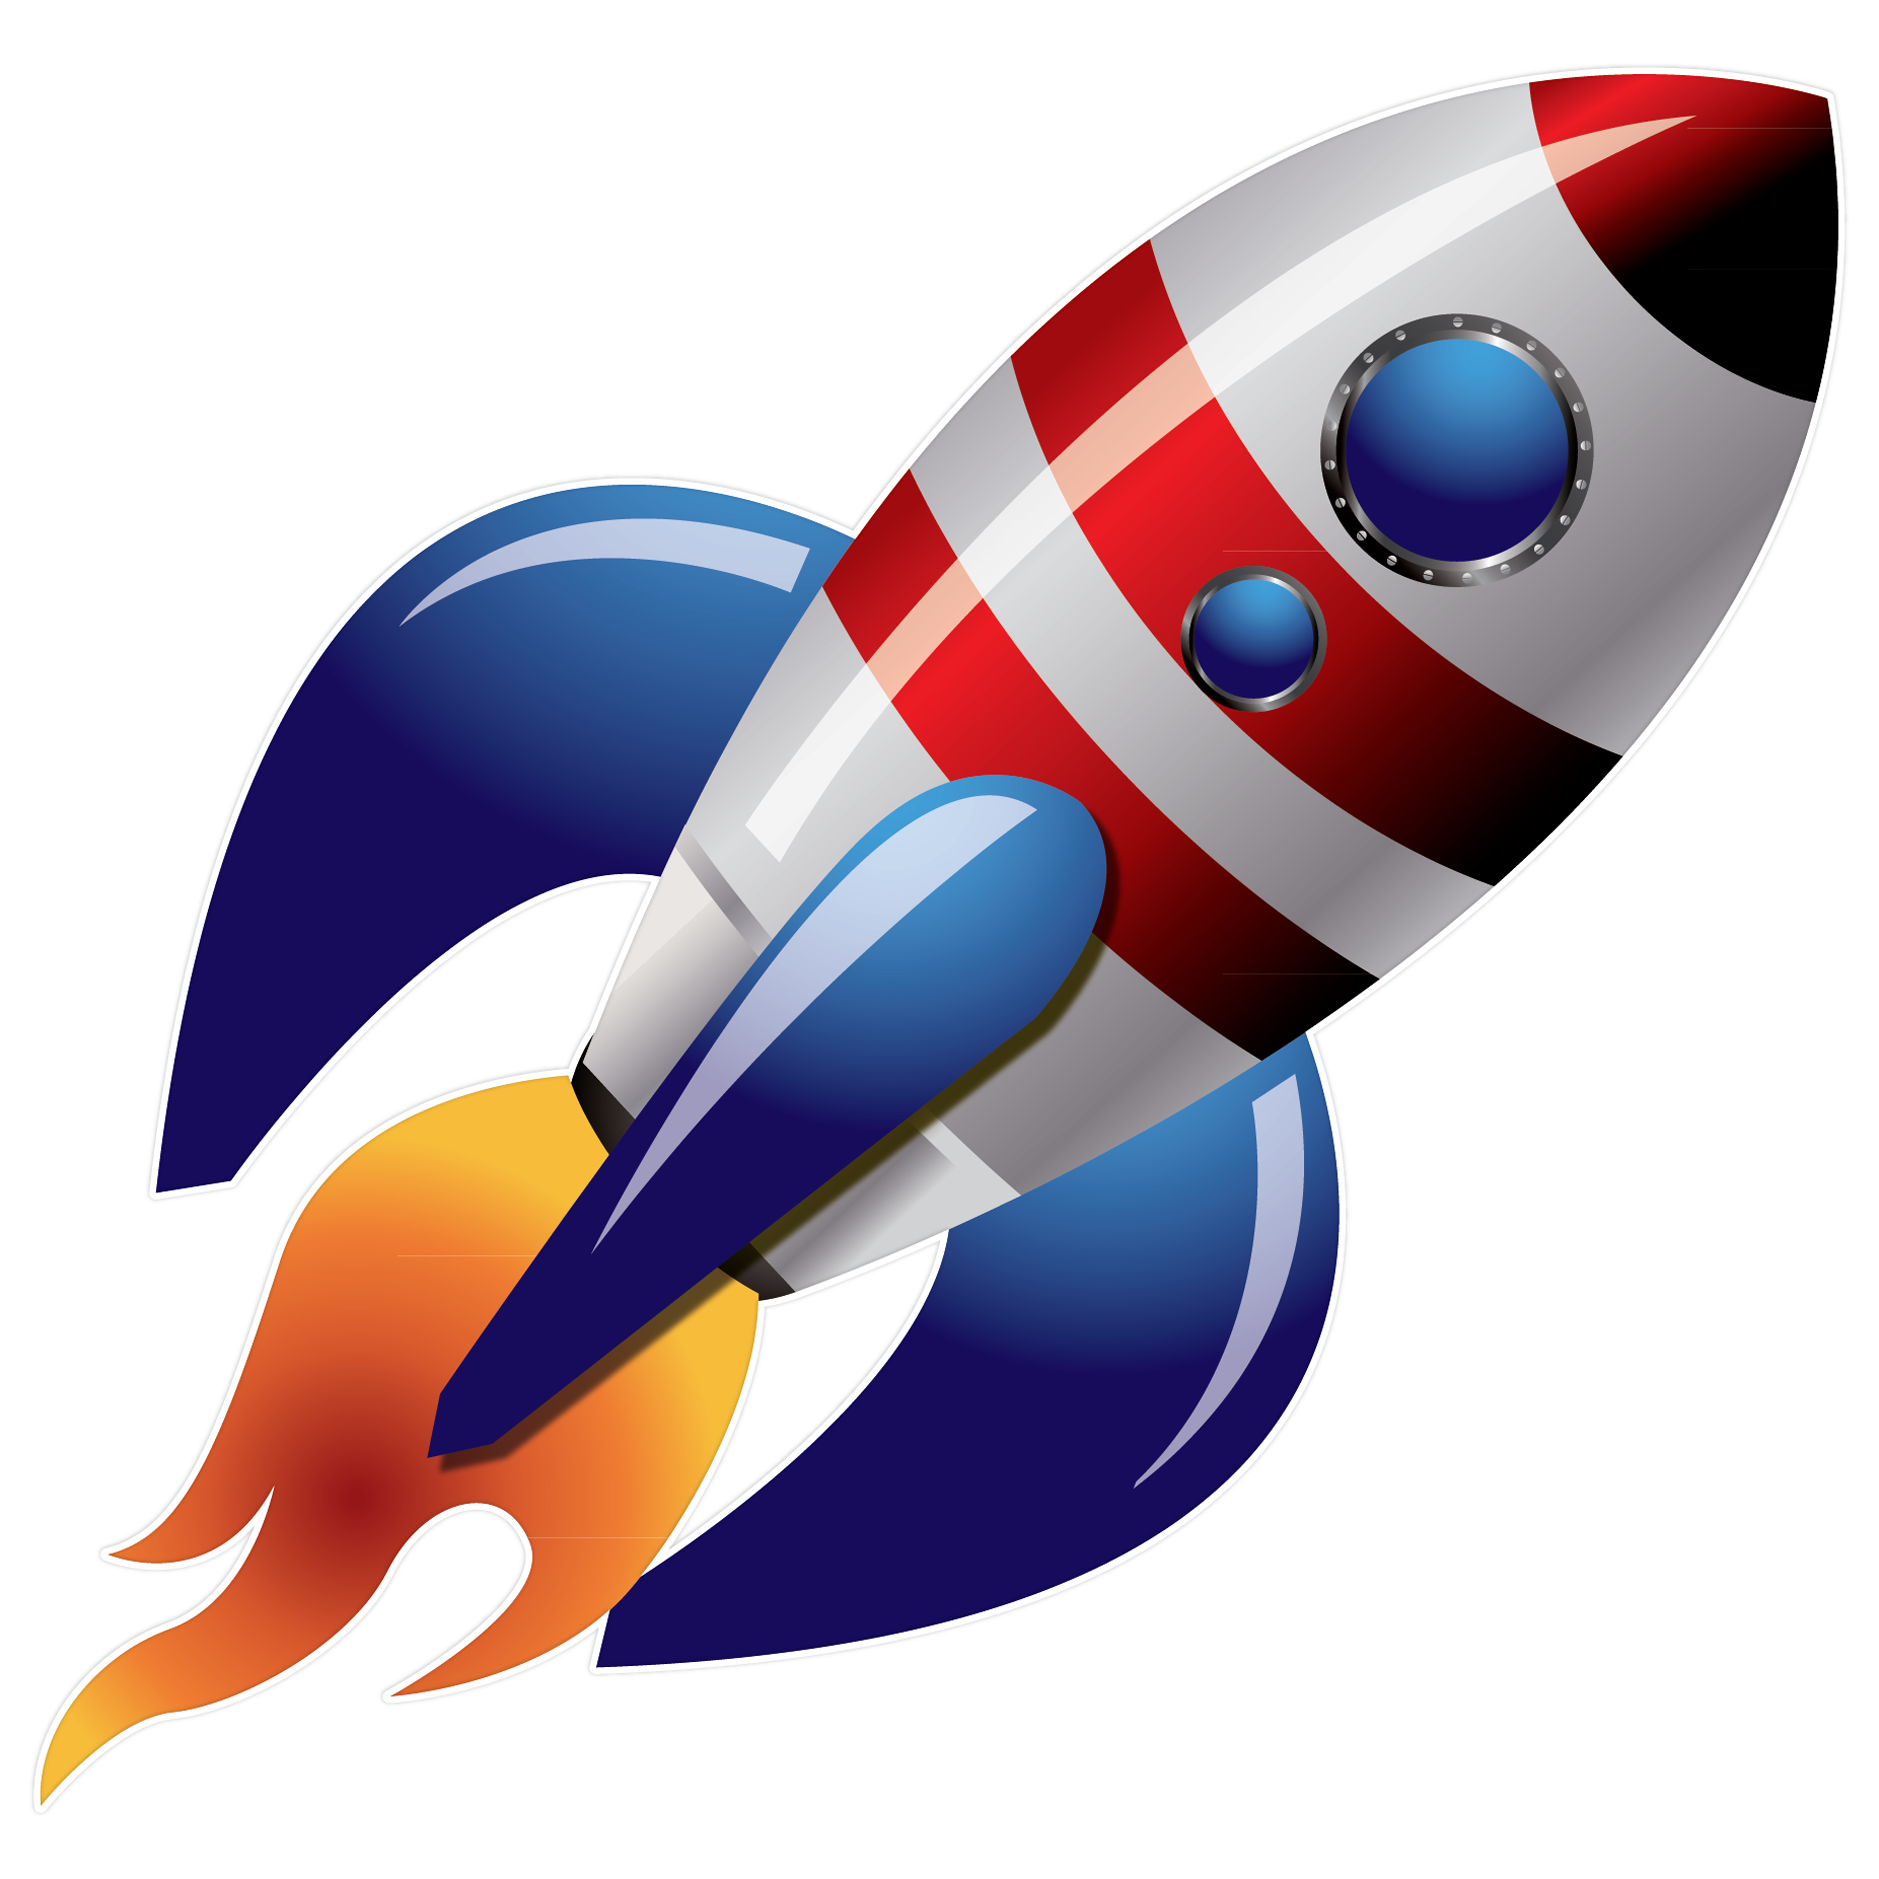 PNG HD Of Rockets - 123679